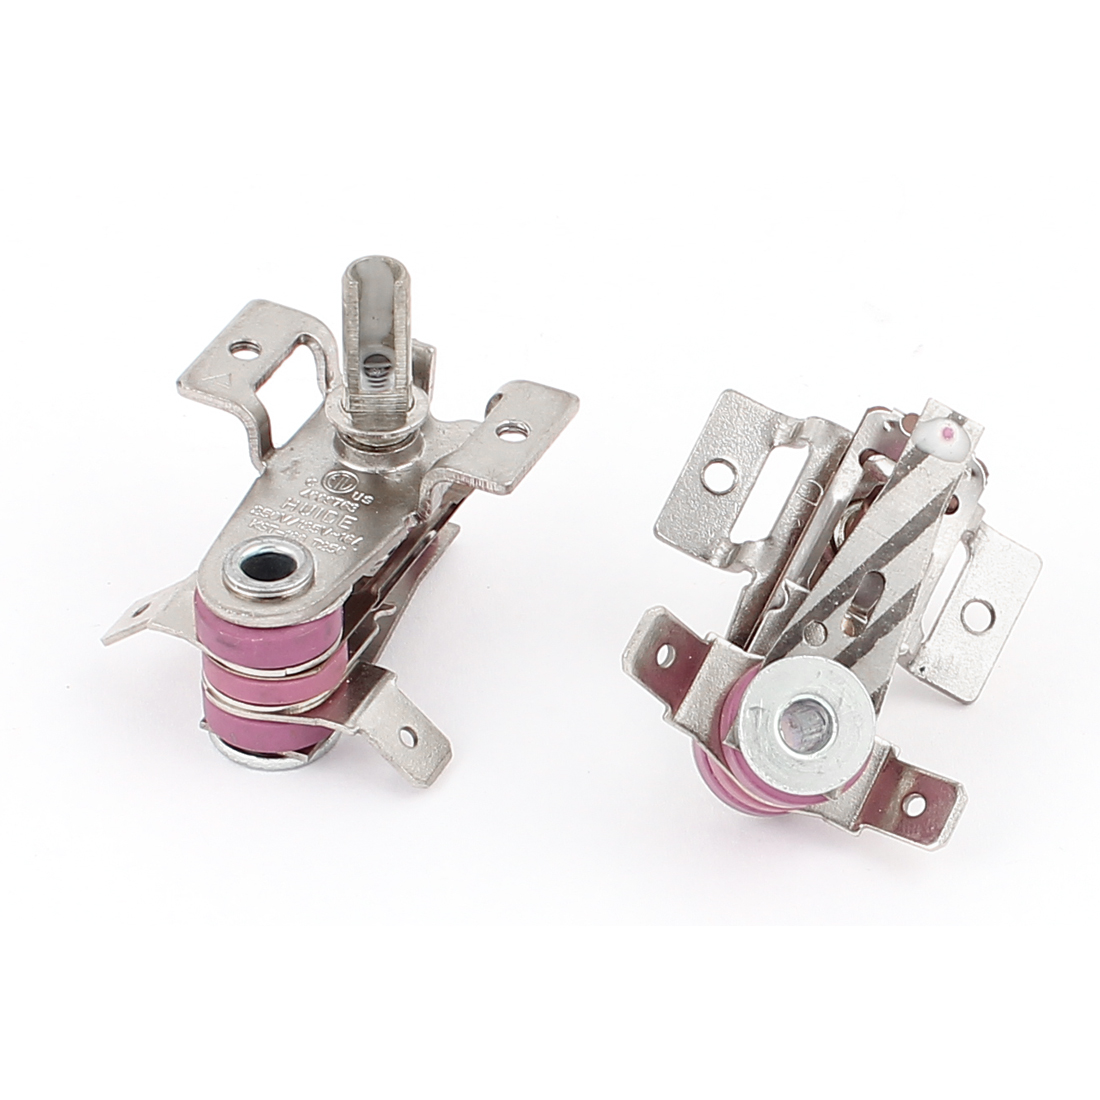 AC 250V/125V 16A Electric Bimetallic Adjustable Thermostat Heating Limiter 2pcs